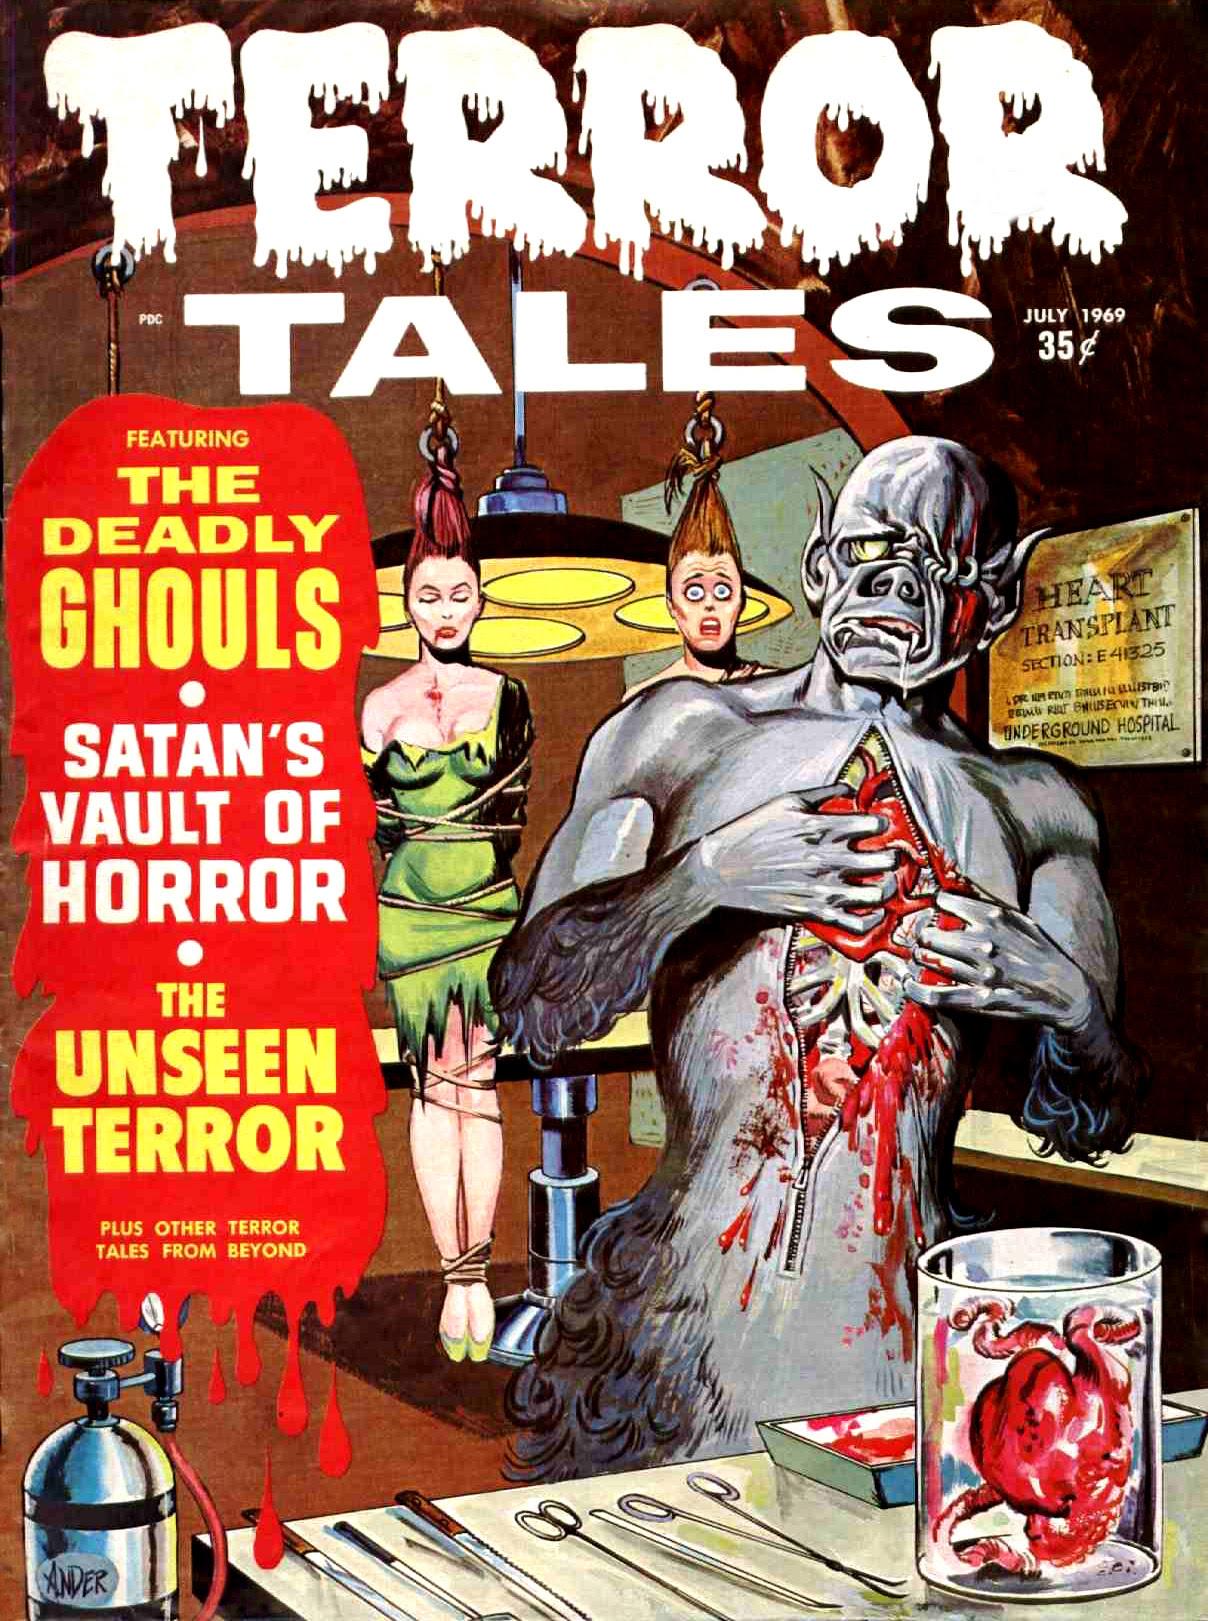 Terror Tales Vol. 01 #9 (Eerie Publications, 1969)